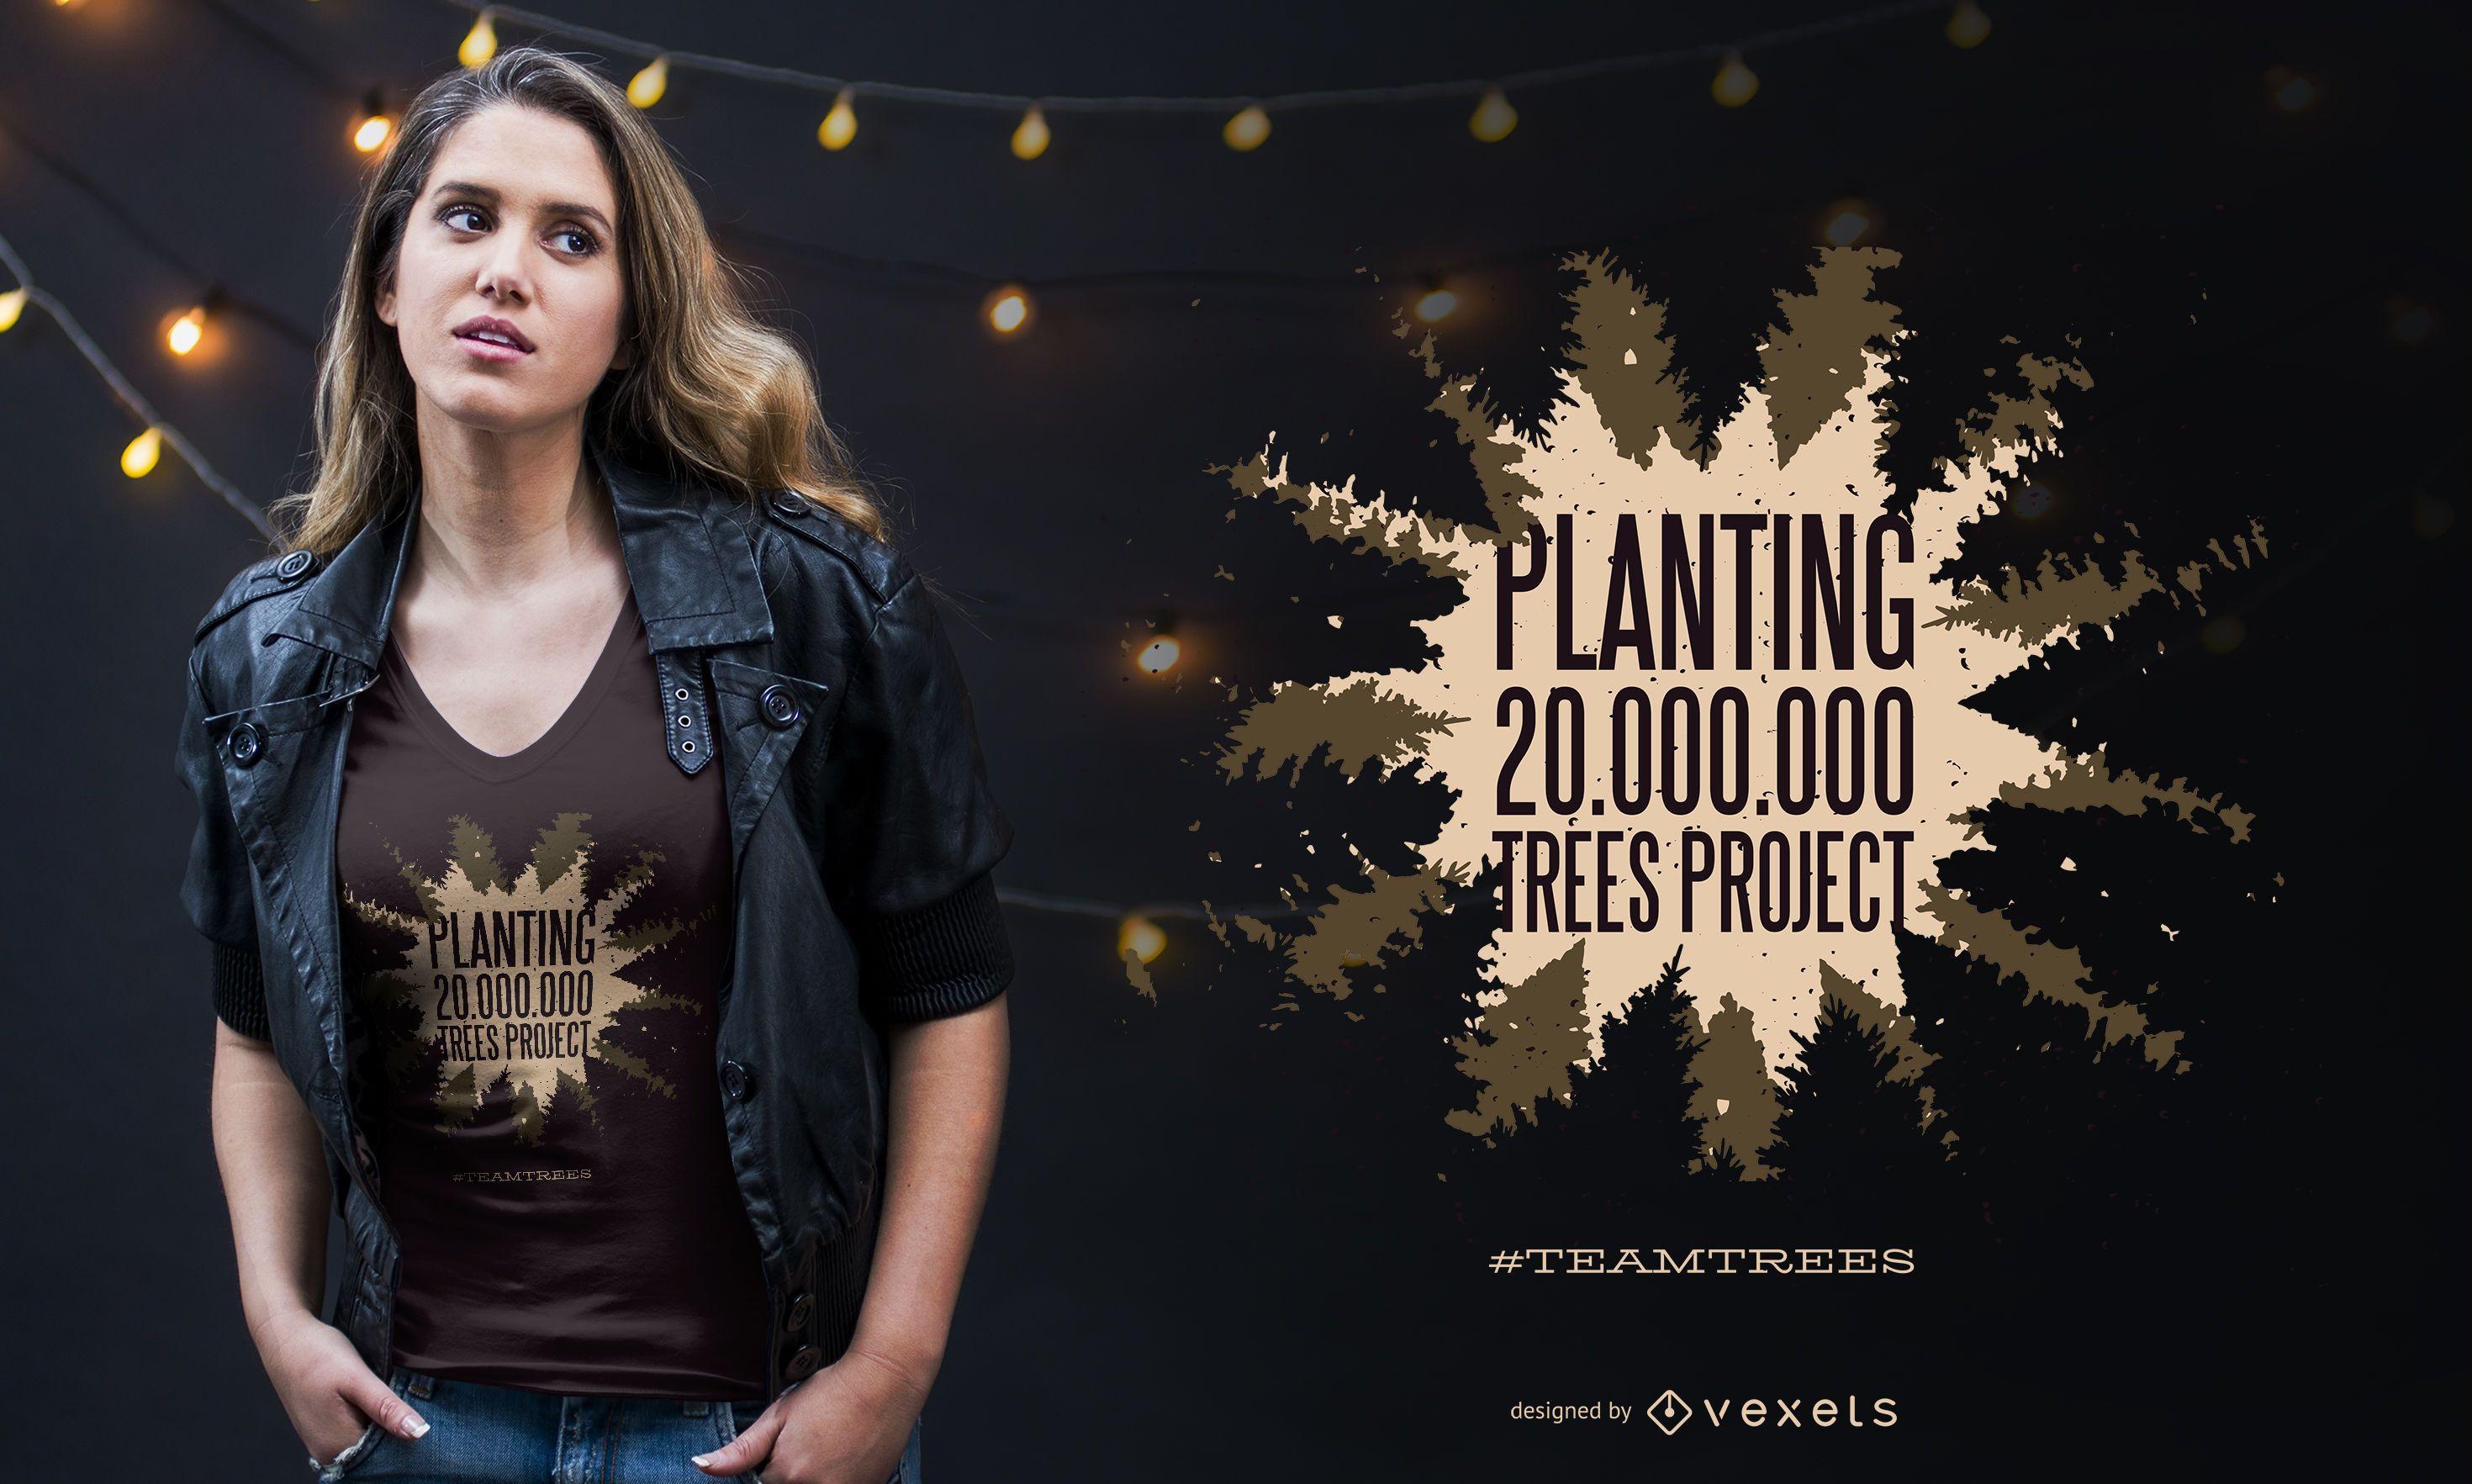 Planting quote t-shirt design